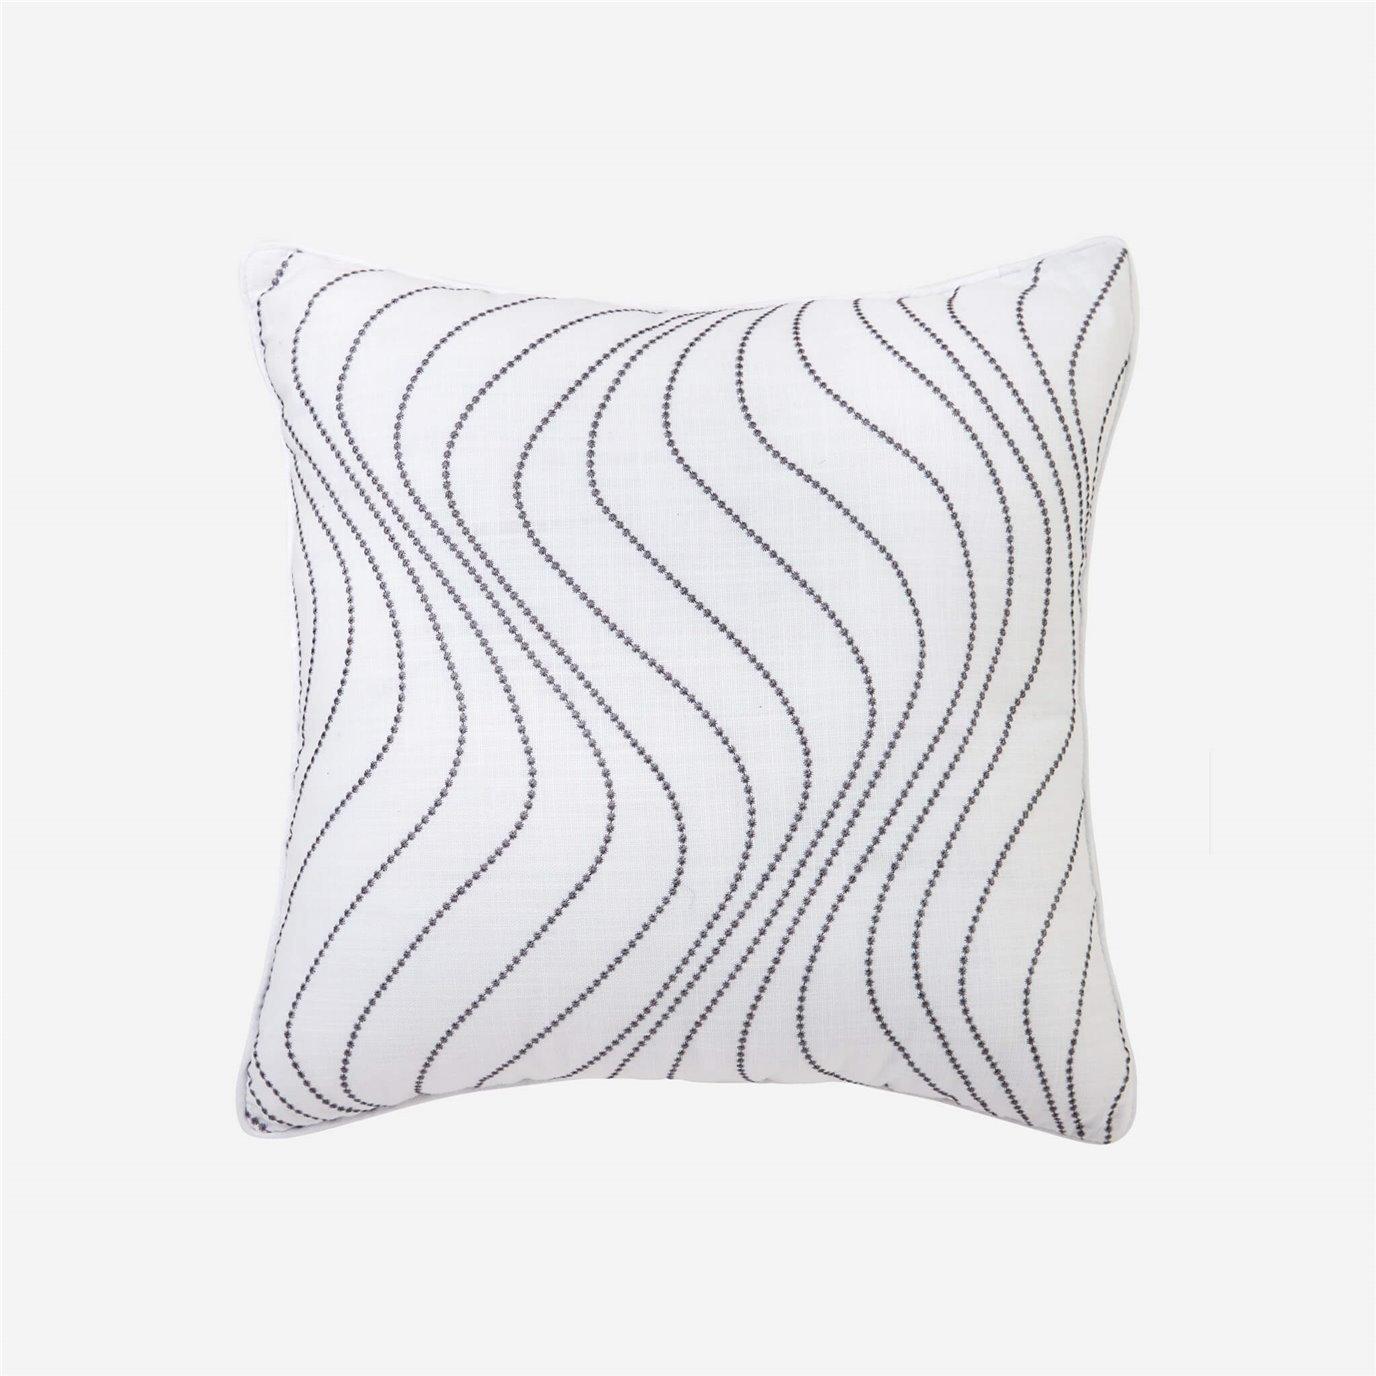 Croscill Saffira Fashion Pillow 16x16